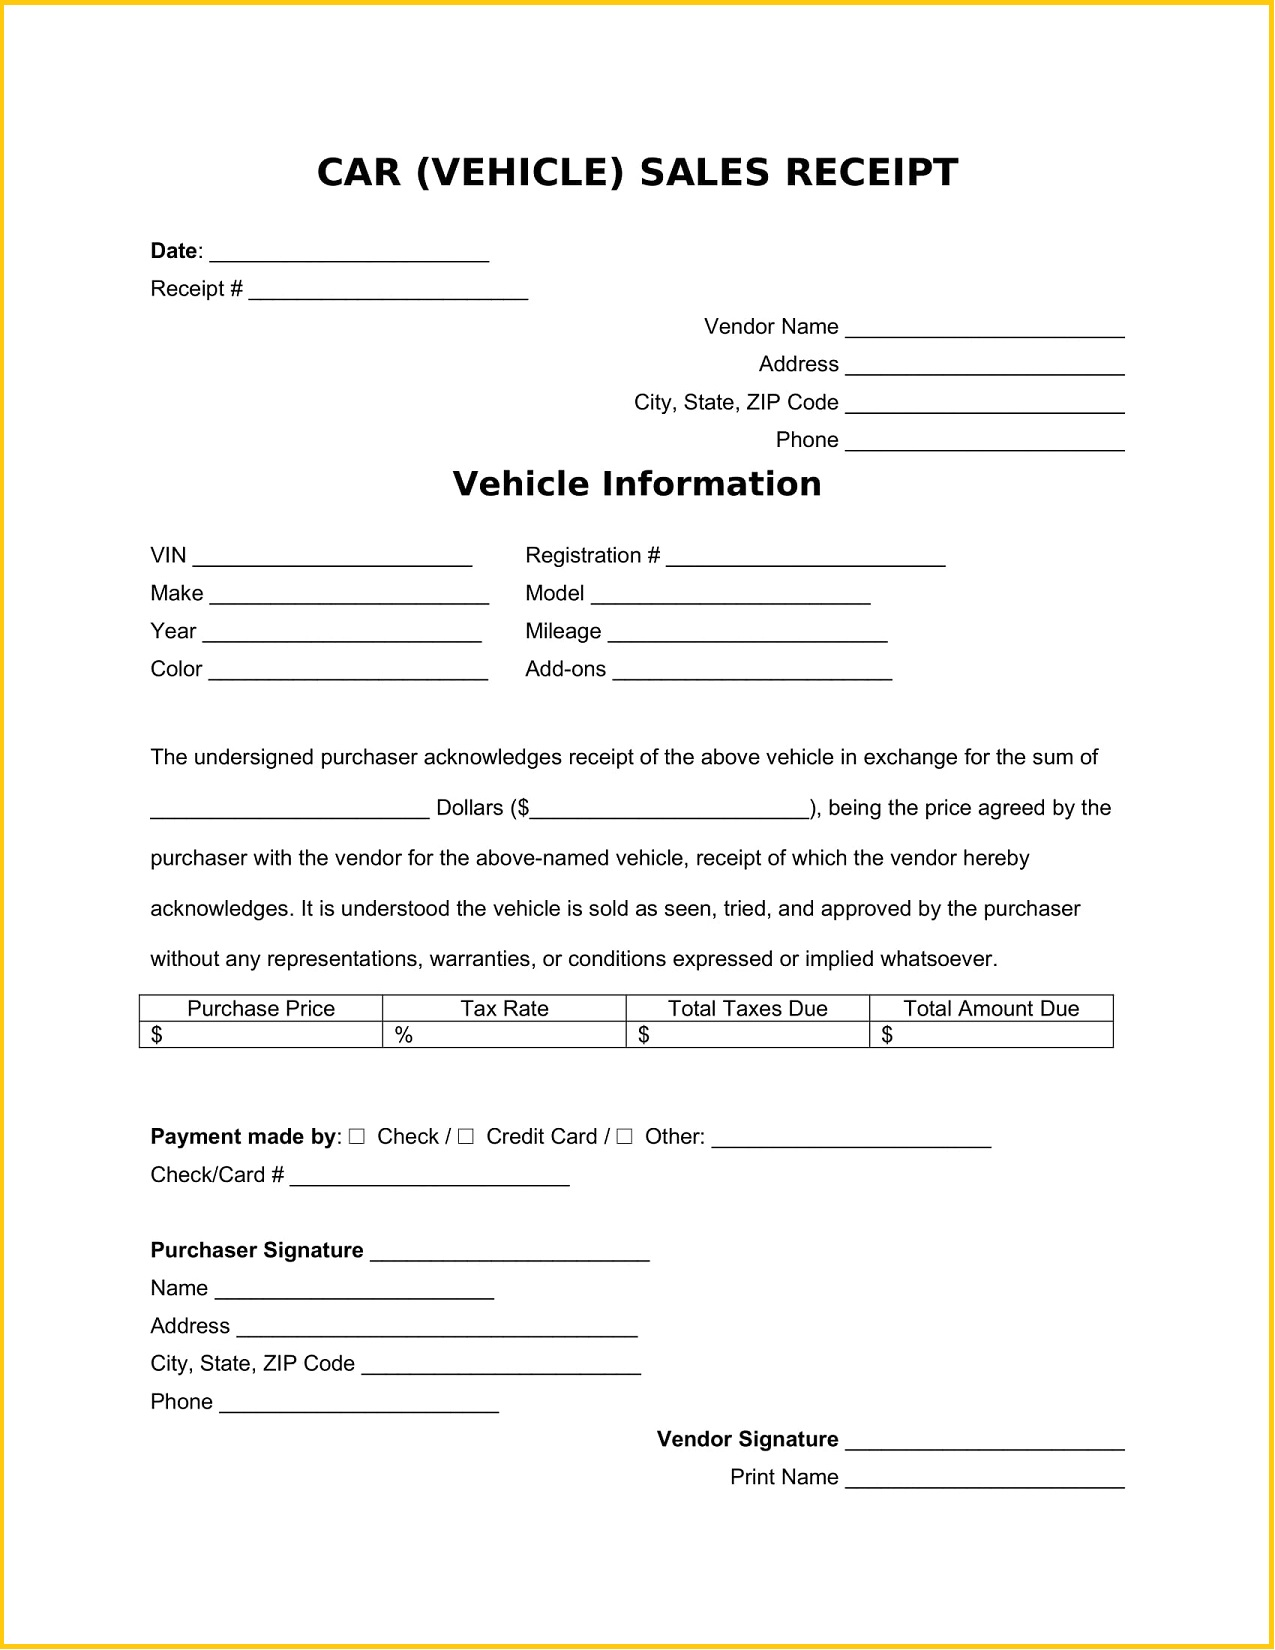 Car Vehicle Sales Receipt Word Template